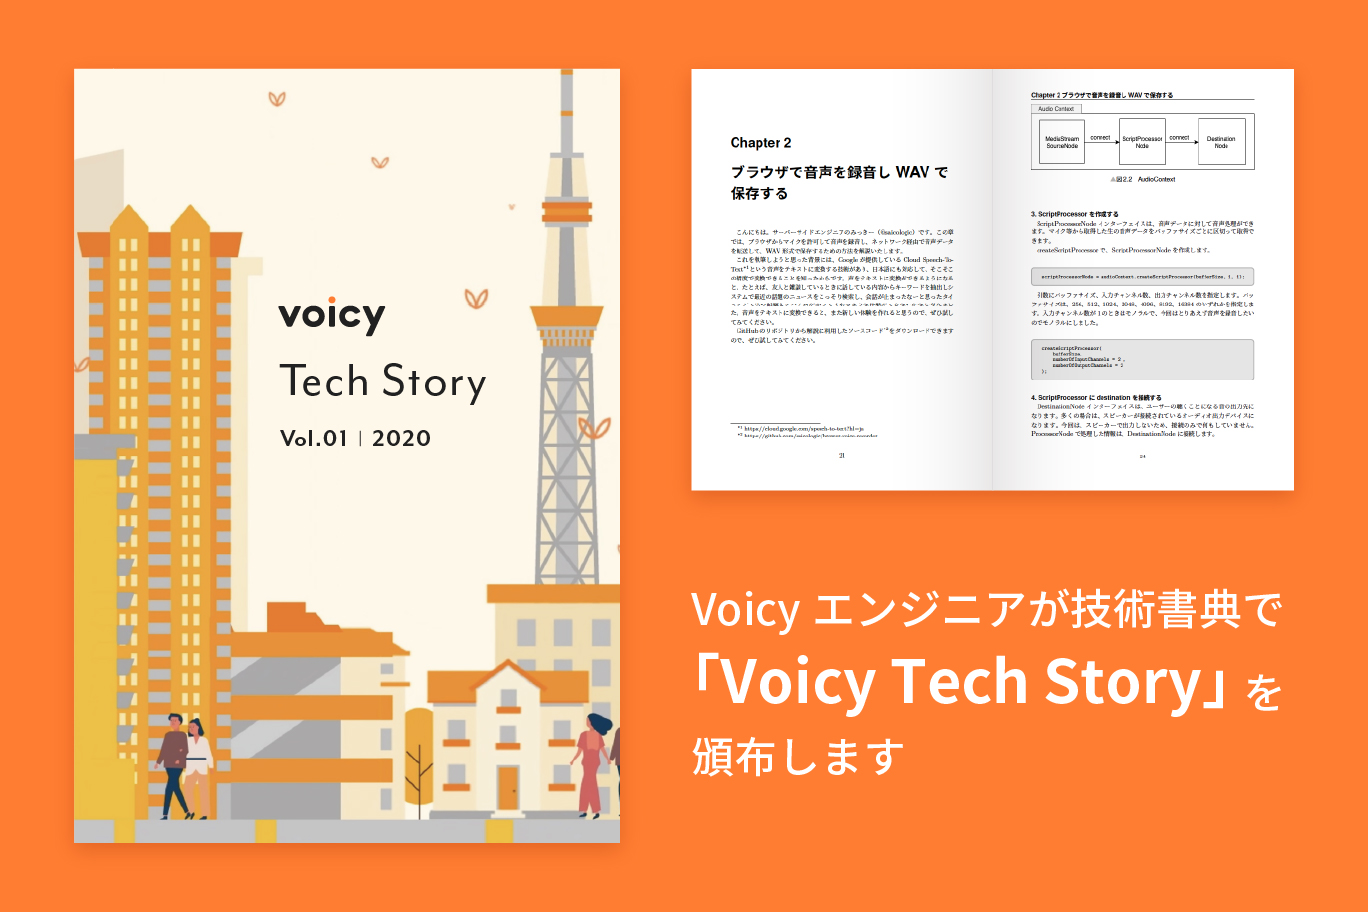 Voicyエンジニアが技術書典で「Voicy Tech Story」を頒布します